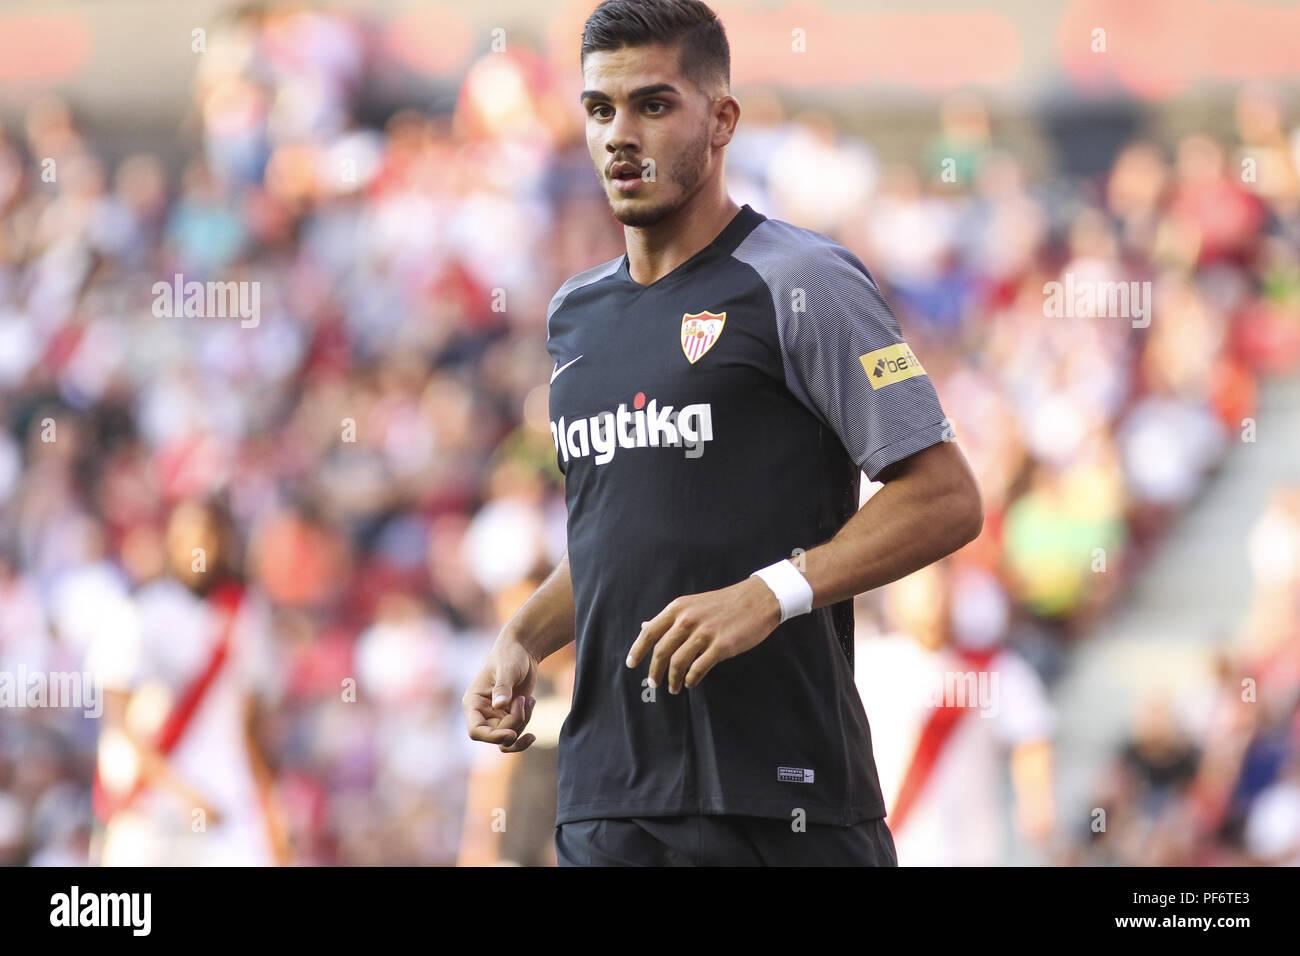 Andre Silva Of Sevilla In Action During The Spanish League La Liga Football Match Between Rayo Vallecano And Sevilla Fc On August 19 2018 At Estadio De Vallecas In Madrid Spain 19th